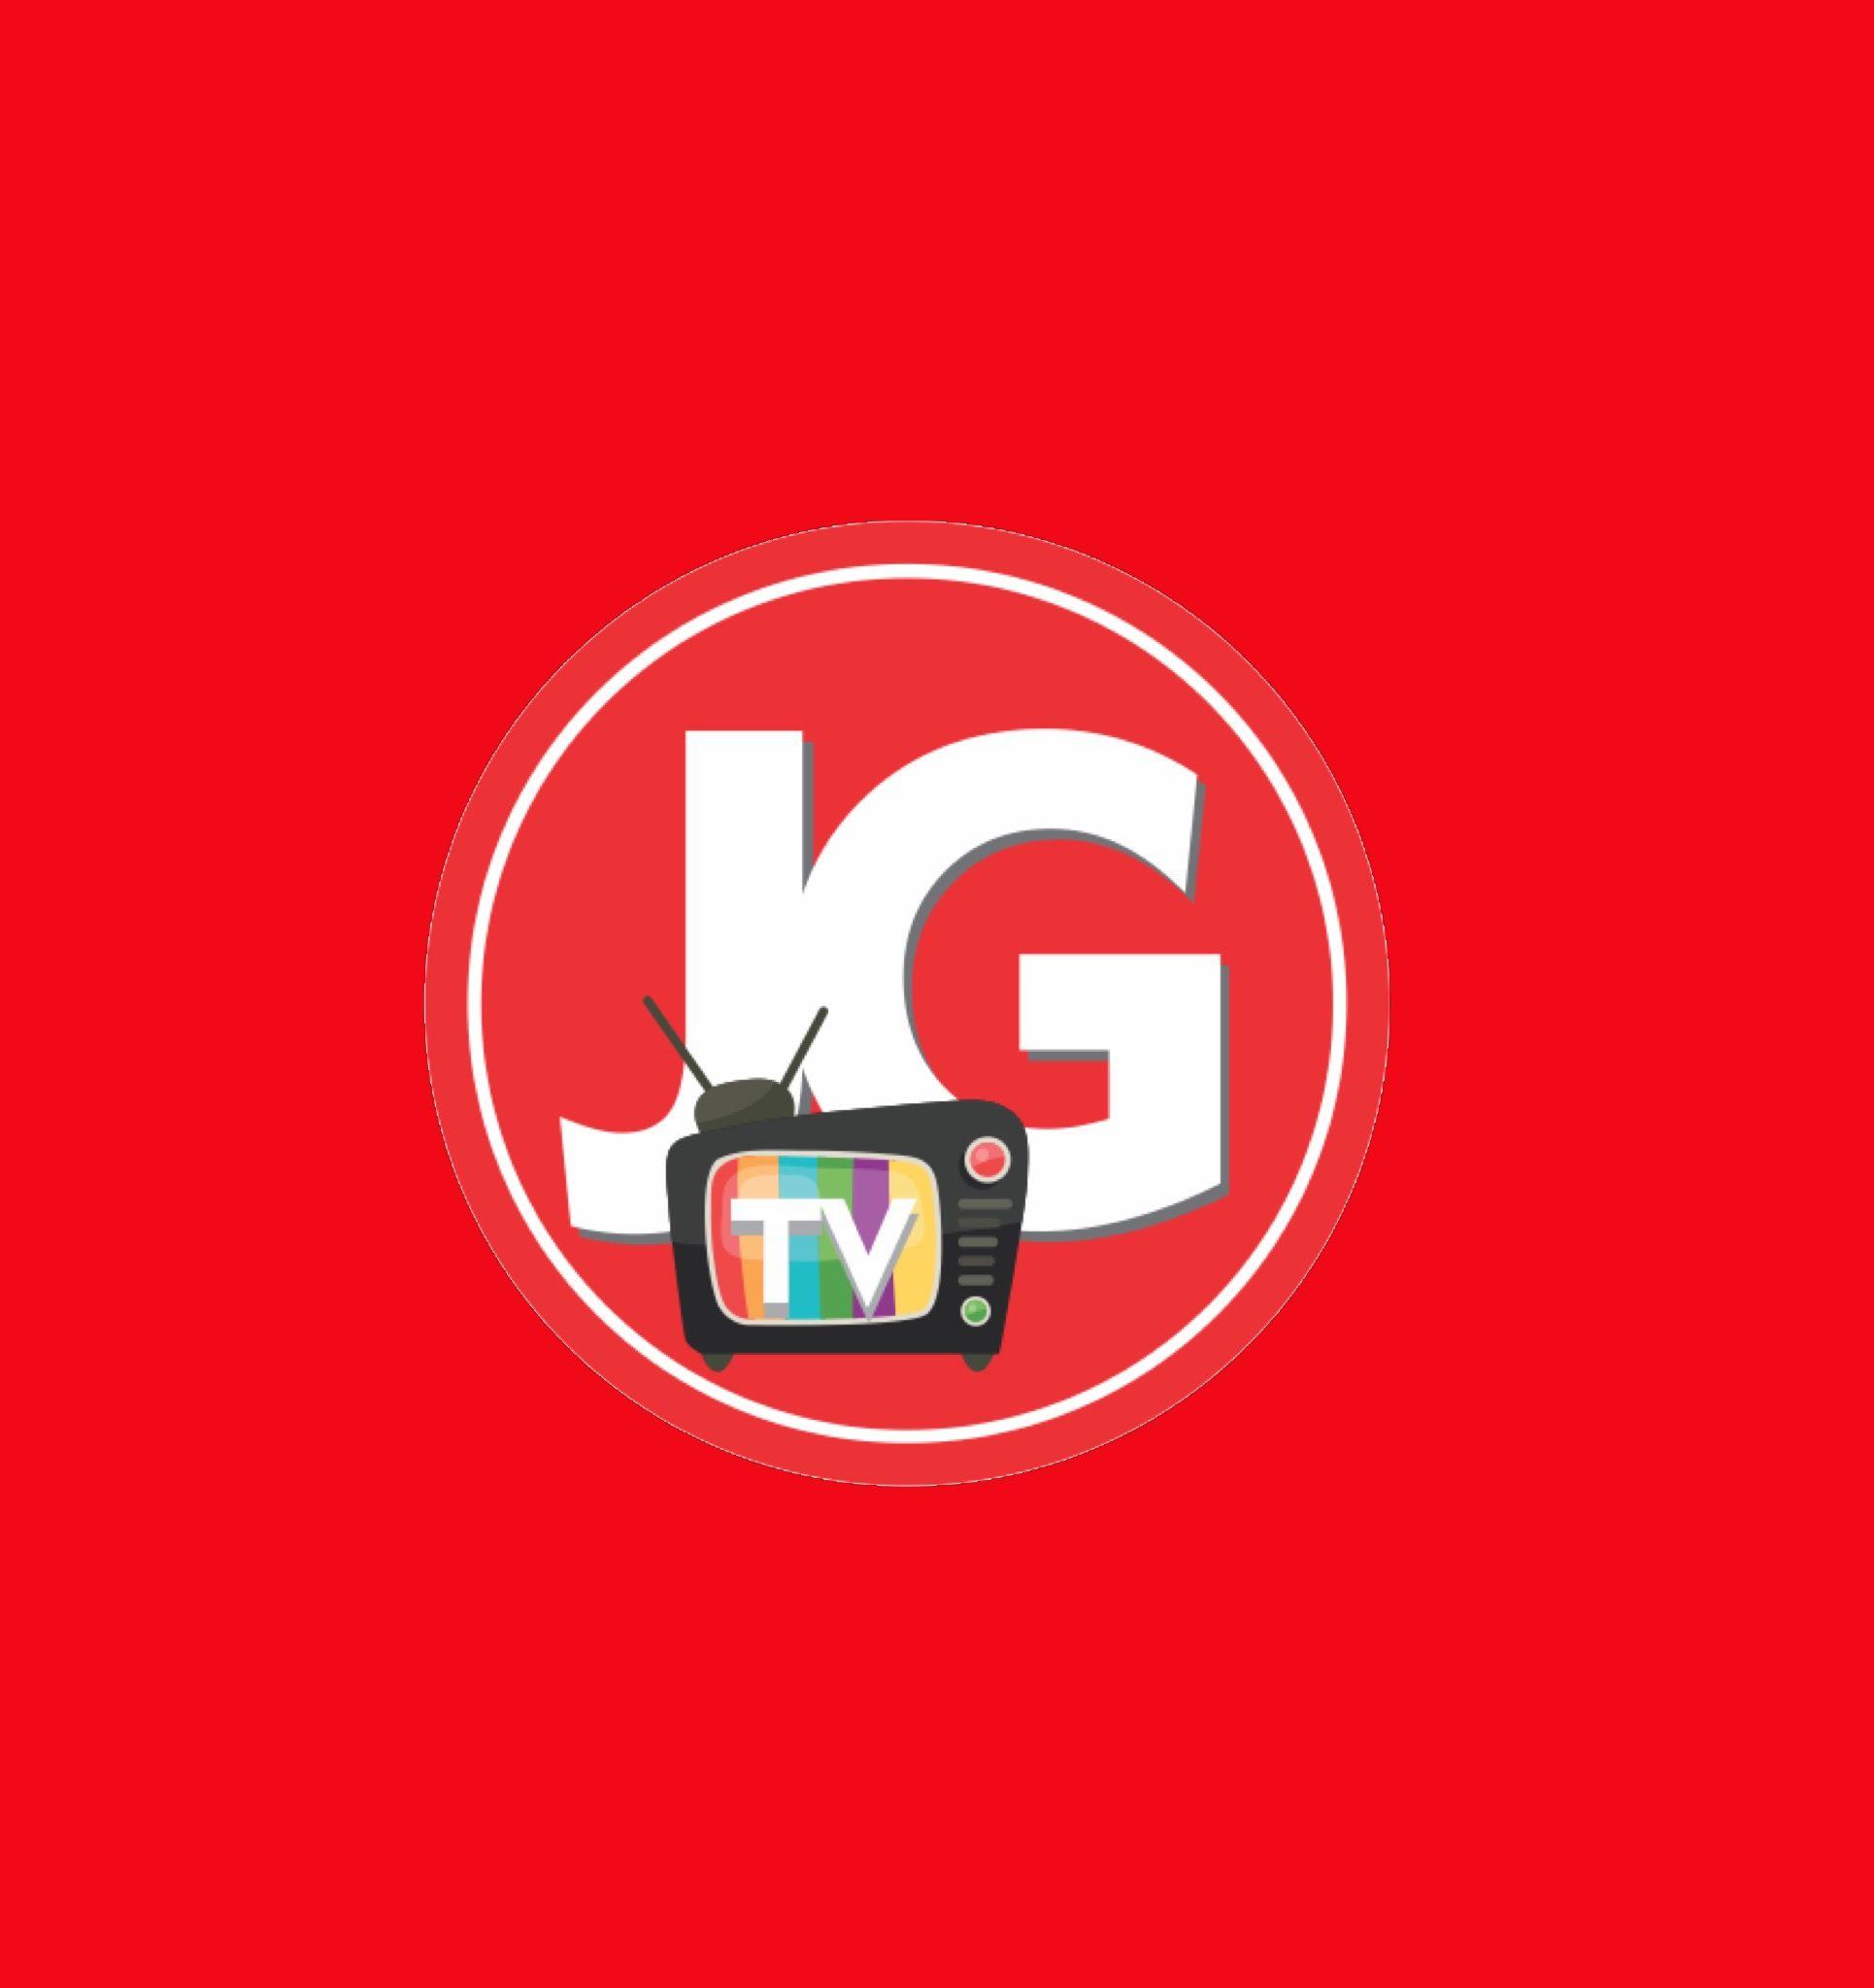 Logo JG  Nupapel Designer  www.nupapel.com WhatsApp 81-98161-8181 Instagram @nupapel Facebook Nupapel Designer